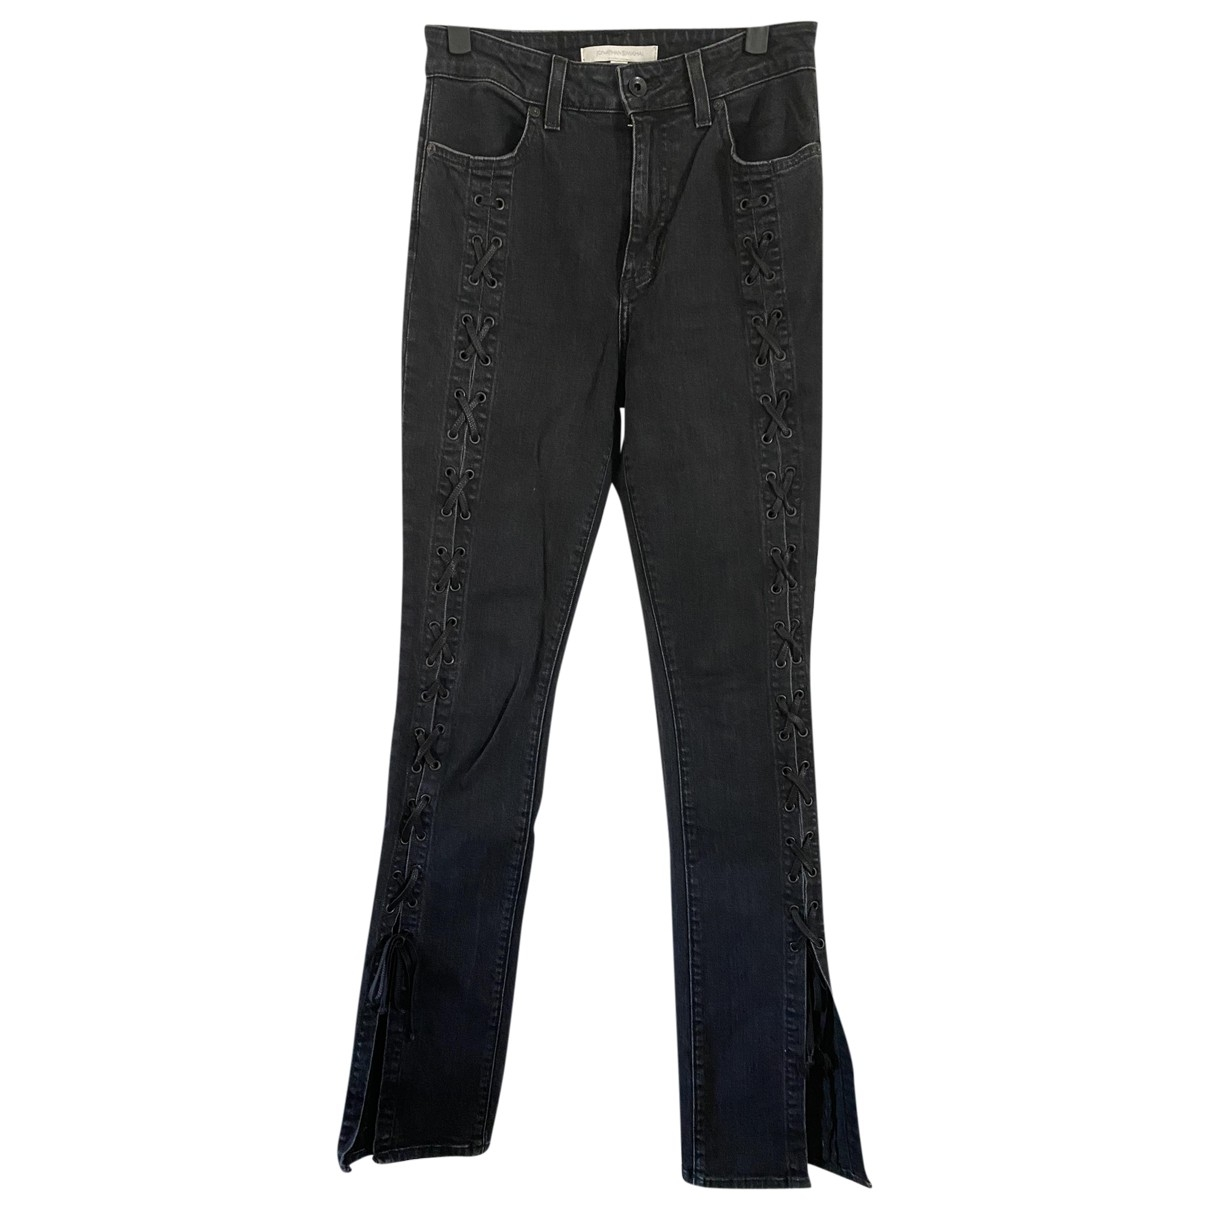 Jonathan Simkhai \N Black Cotton - elasthane Jeans for Women 26 US